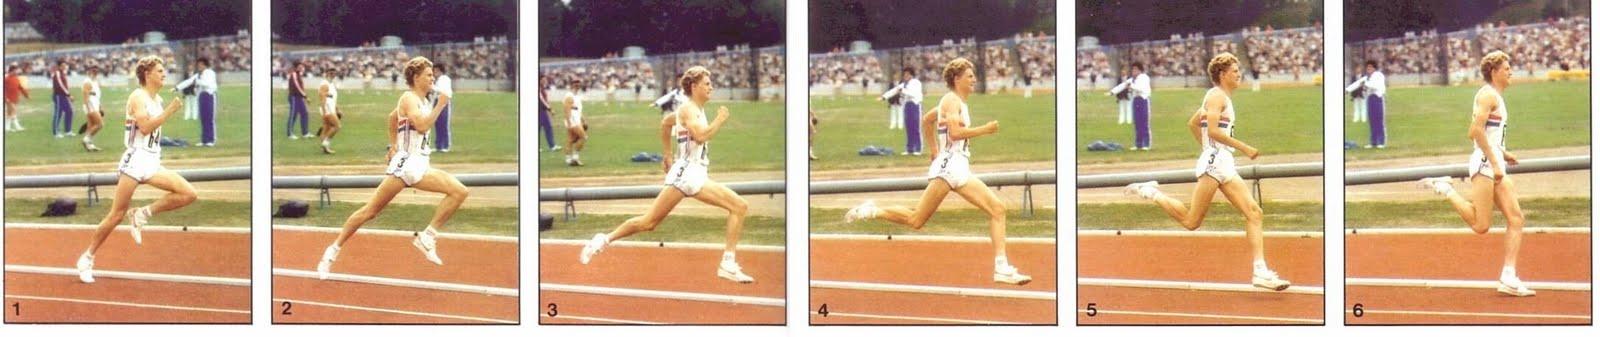 how to run faster longer stride